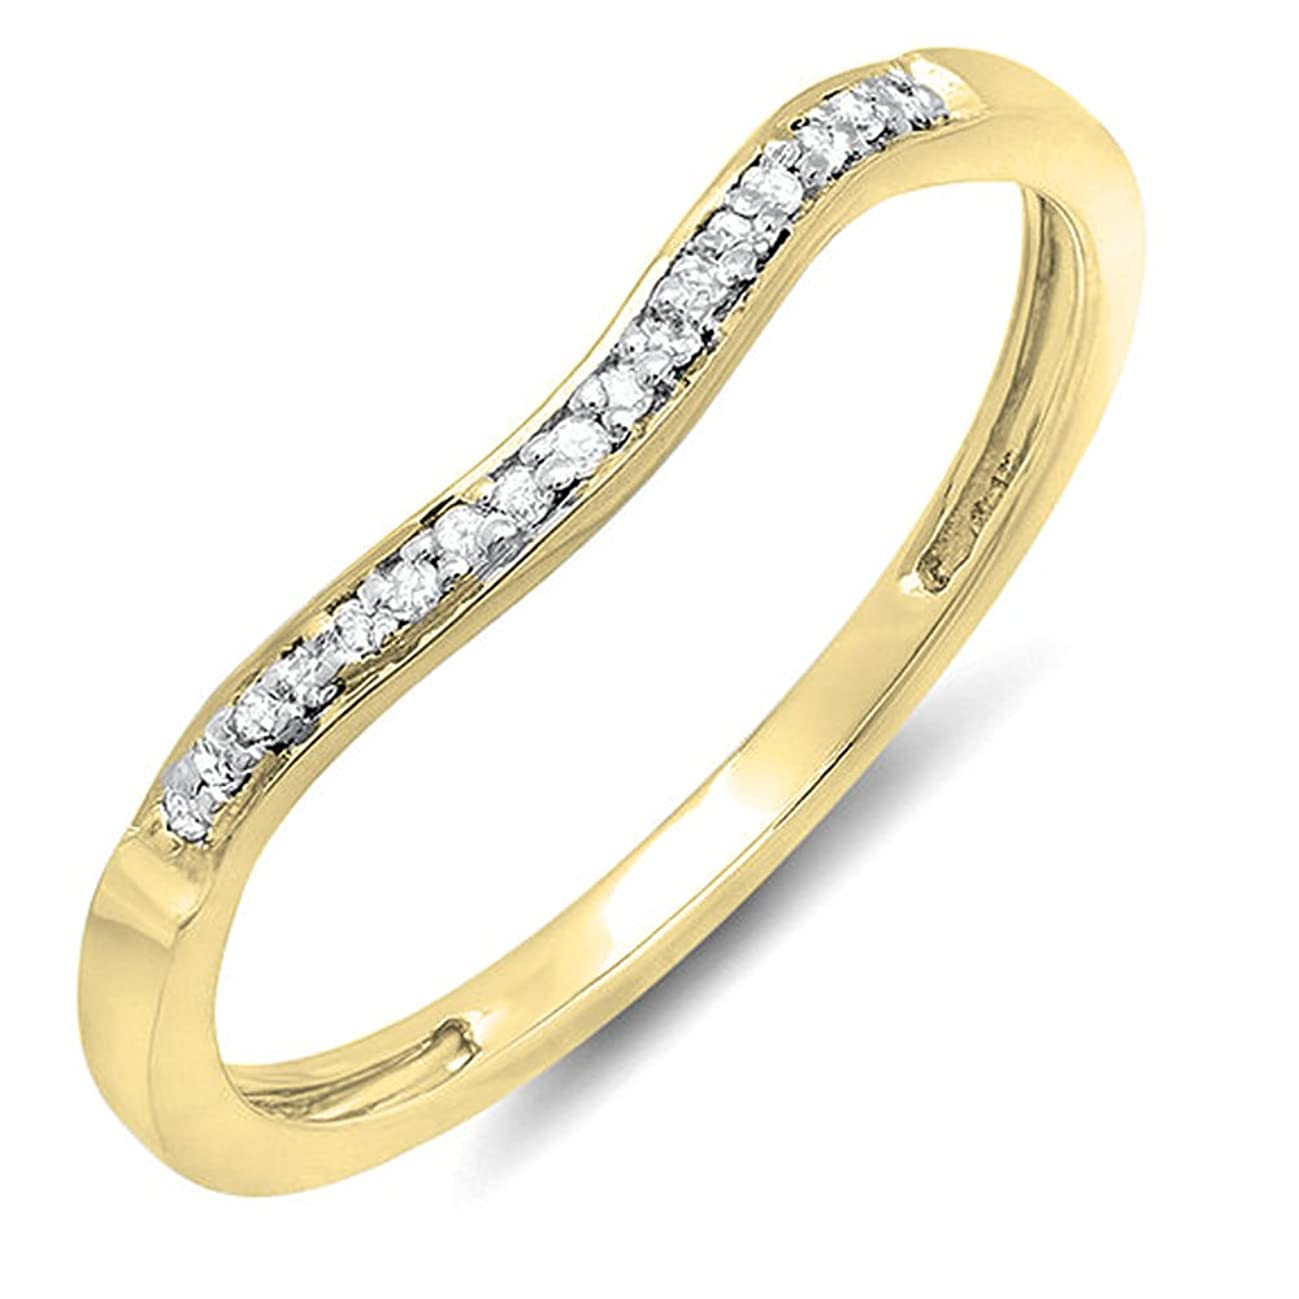 0.10 Carat (ctw) 10K Gold Round Diamond Ladies Anniversary Wedding Band Guard Ring 1/10 CT